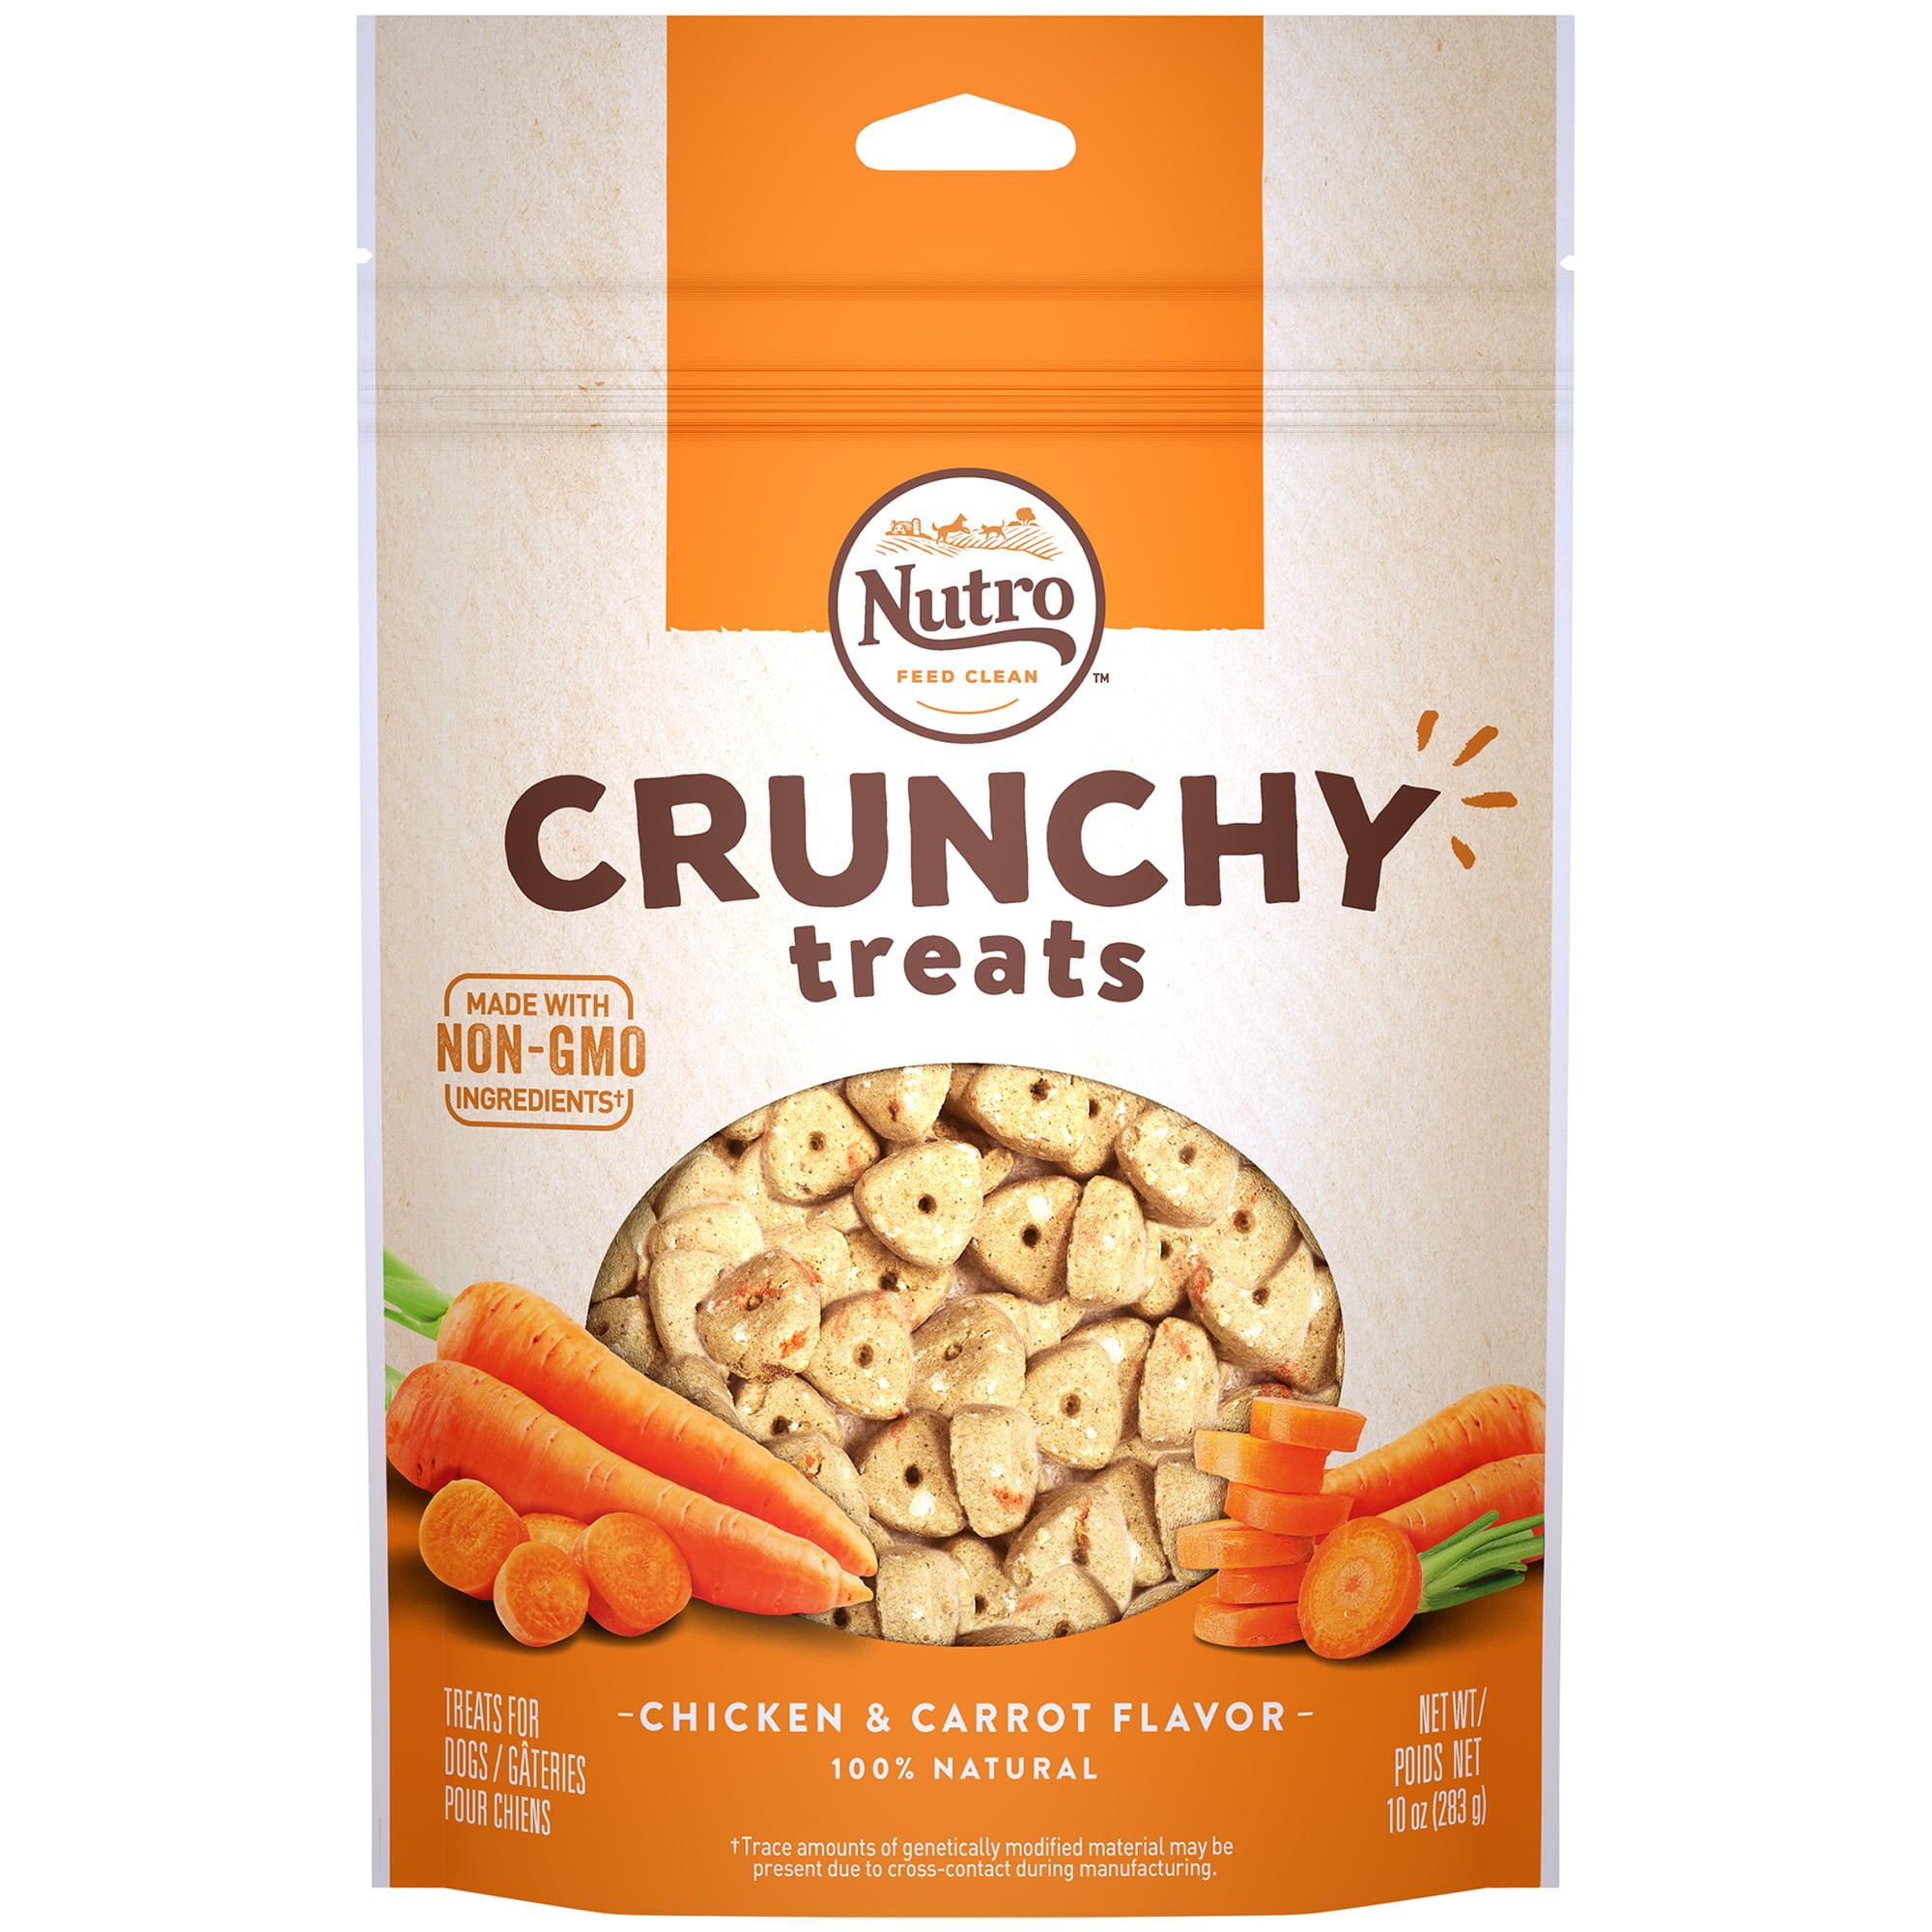 NUTRO Crunchy Dog Treats Chicken & Carrot Flavor, 10 Oz